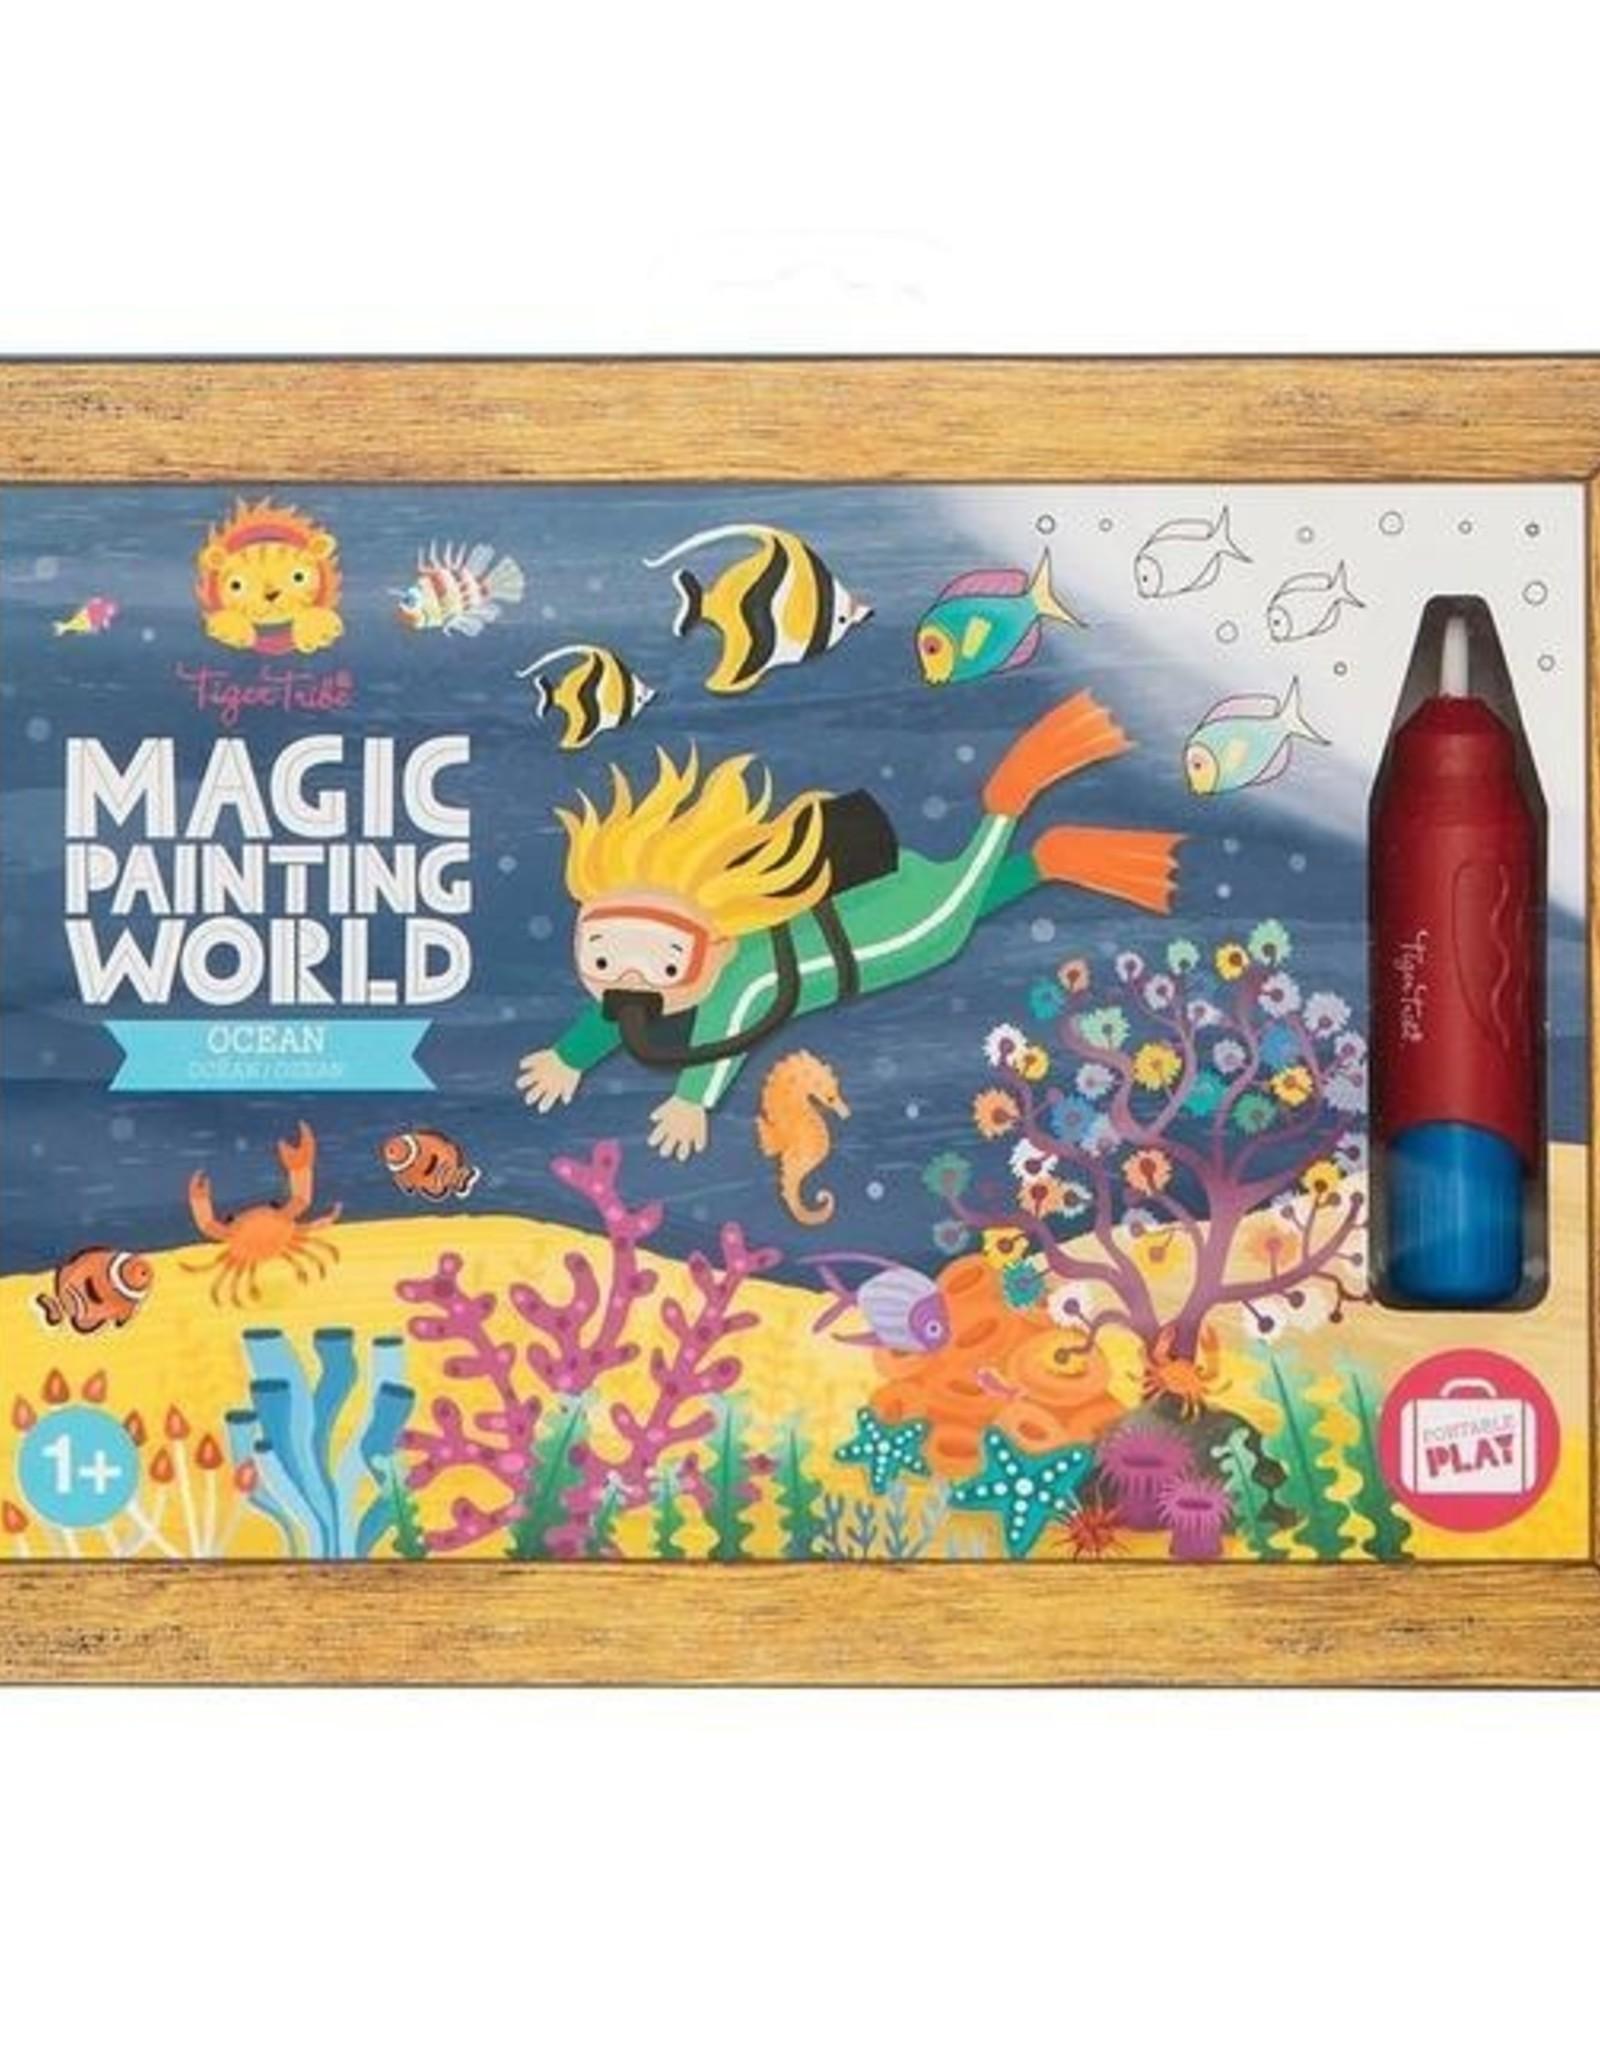 Tiger Tribe Magic Painting World - Ocean